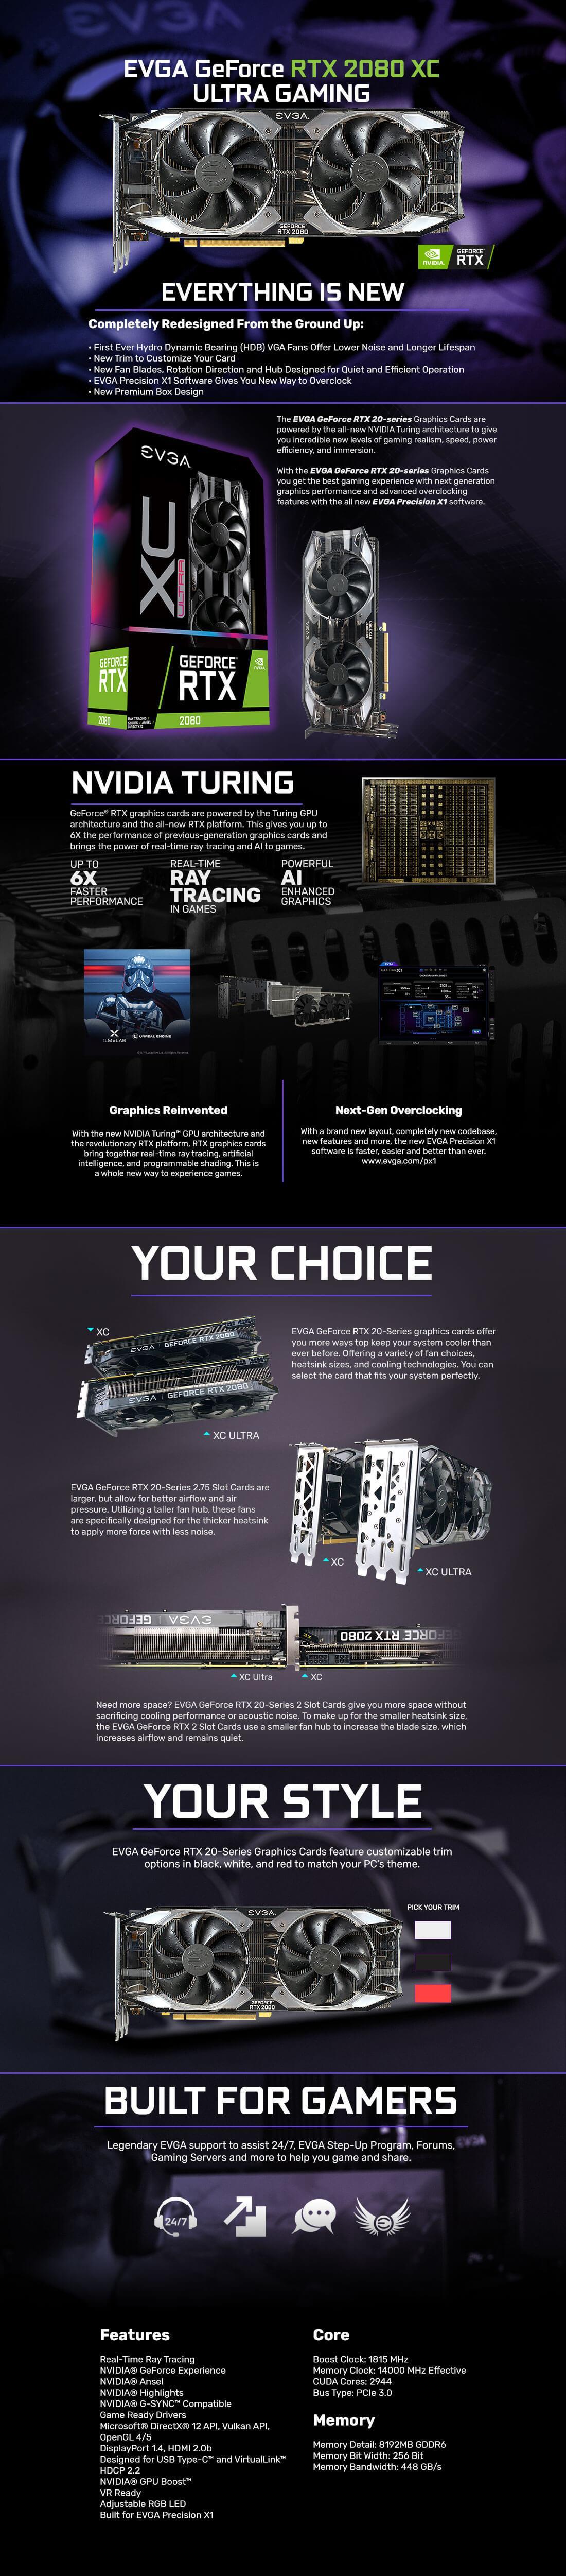 Buy The Evga Geforce Rtx 2080 Xc Ultra 8gb Gddr6 Gaming Garphics Segotep Ramadan 5 Microsoft Directx 12 Api Vulkan Opengl 4